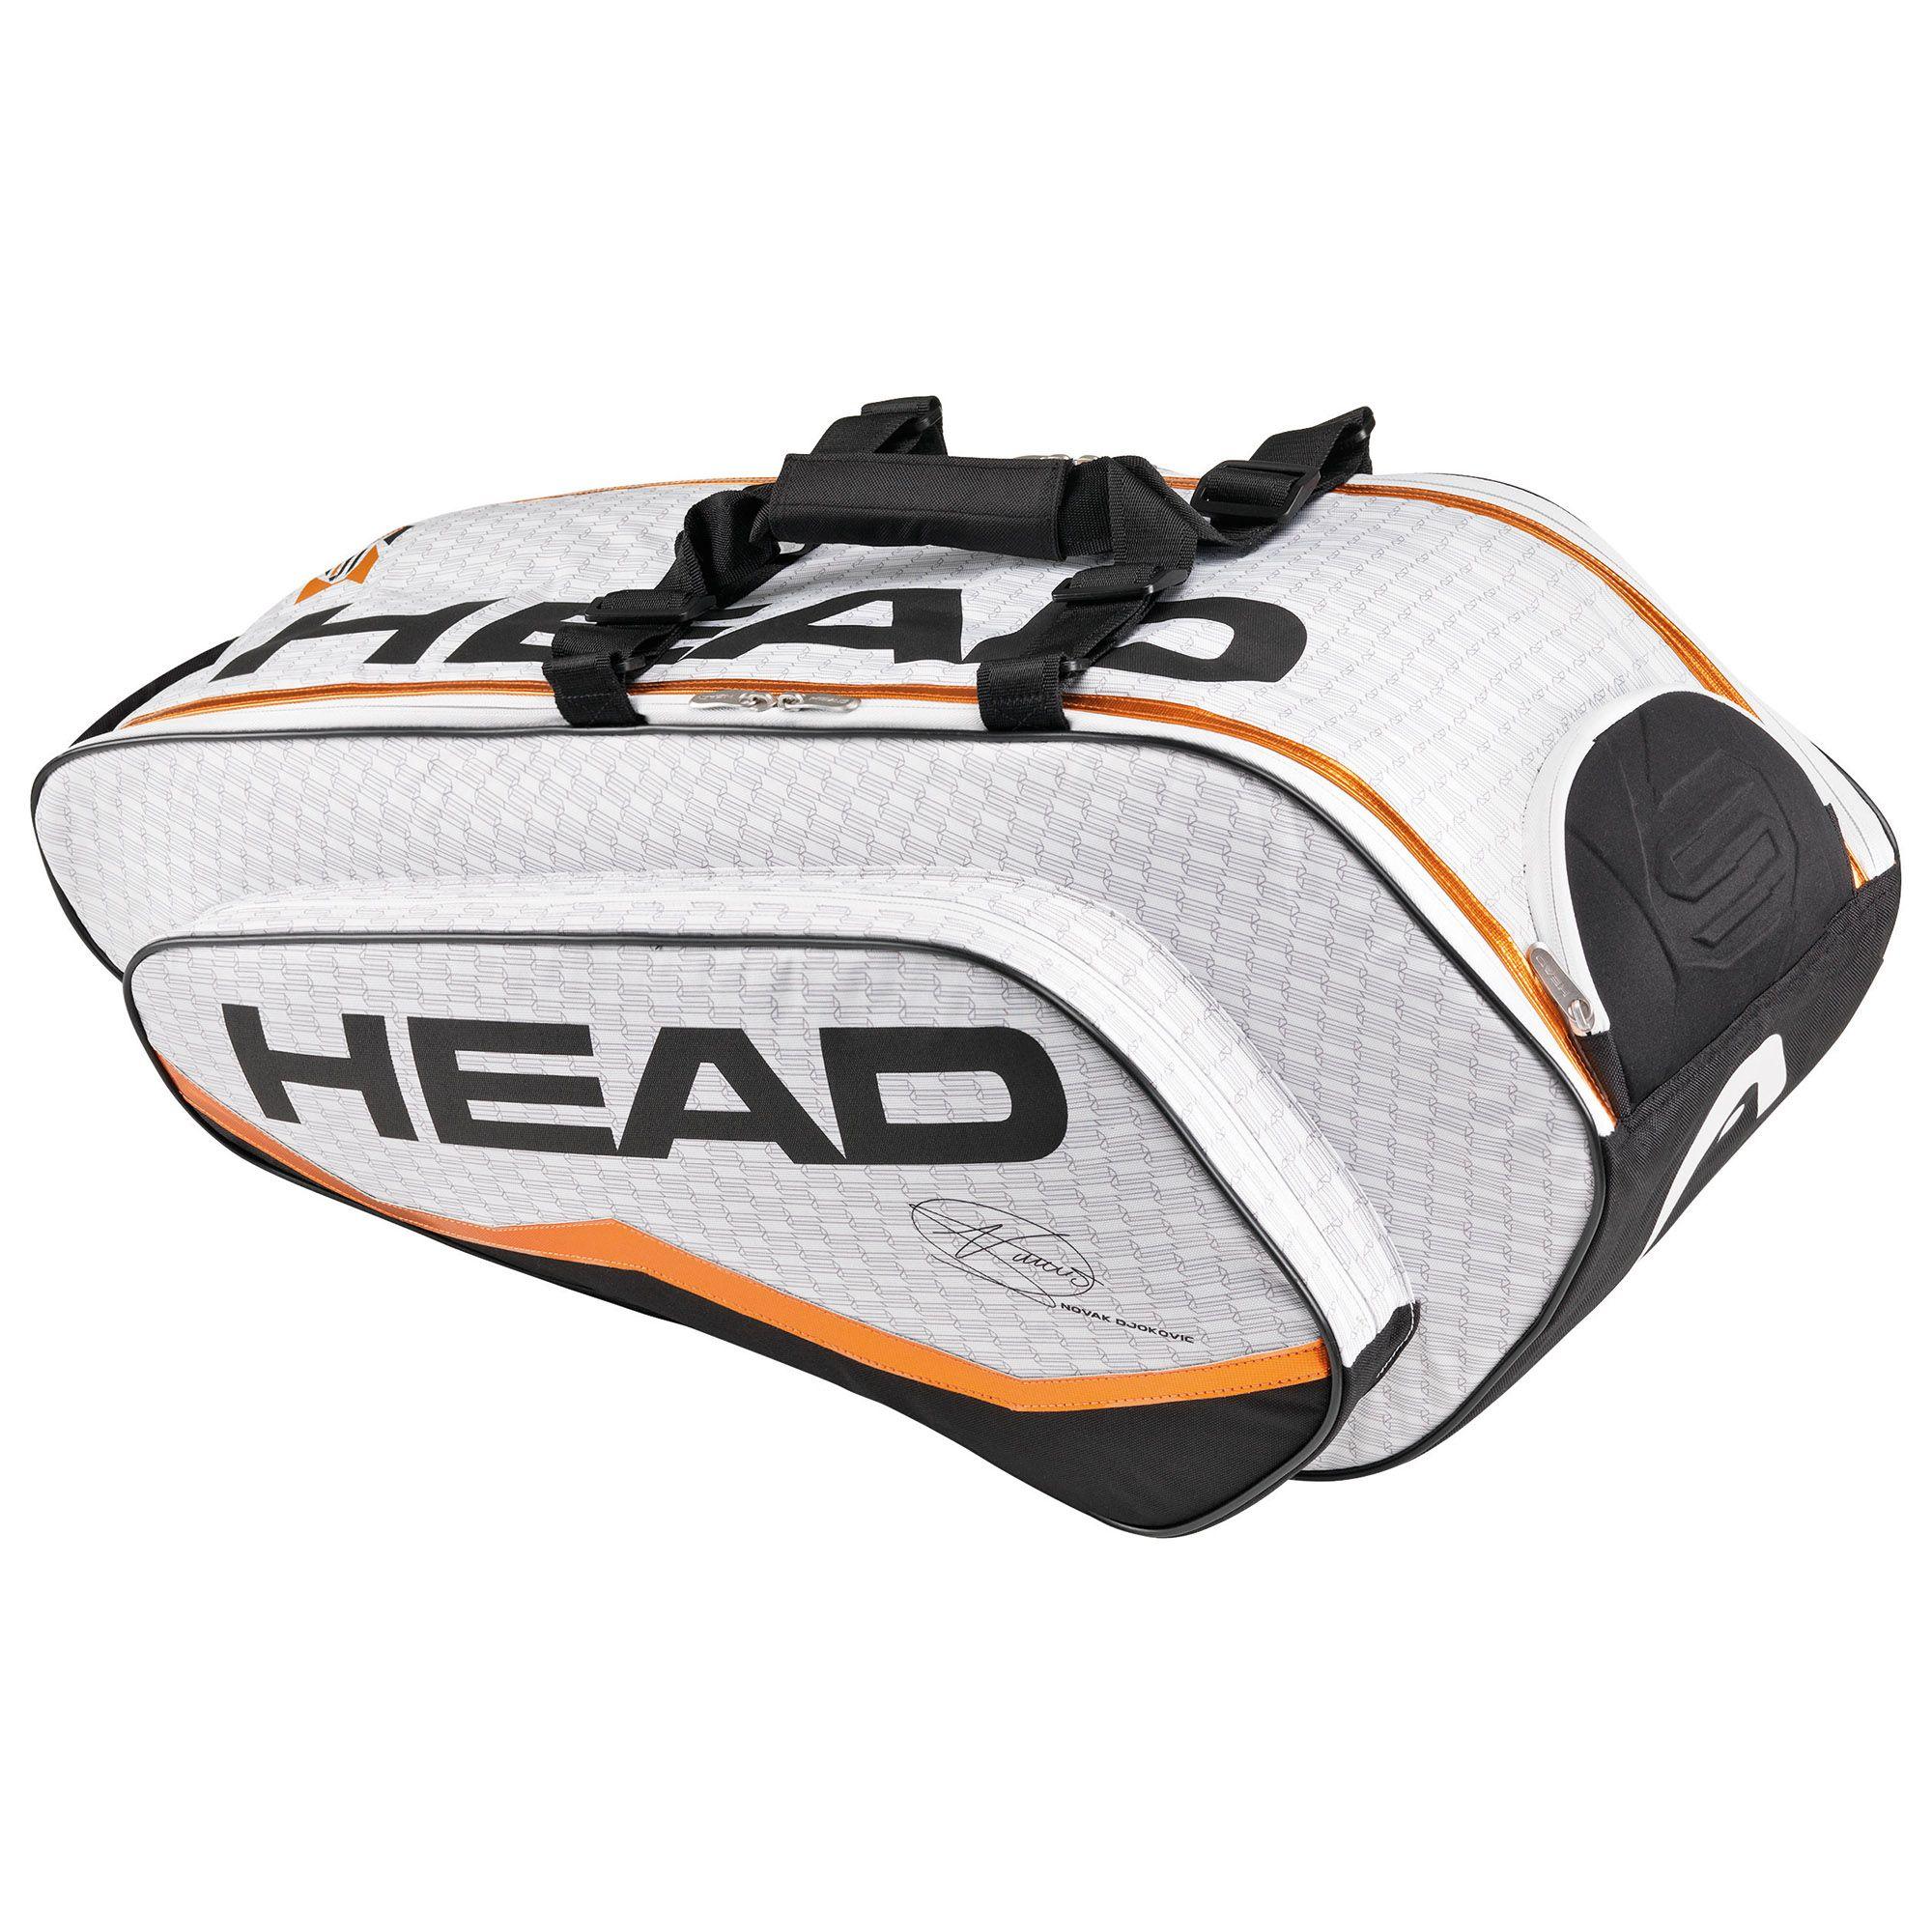 Head Djokovic Combi Racket Bag Sweatband Com